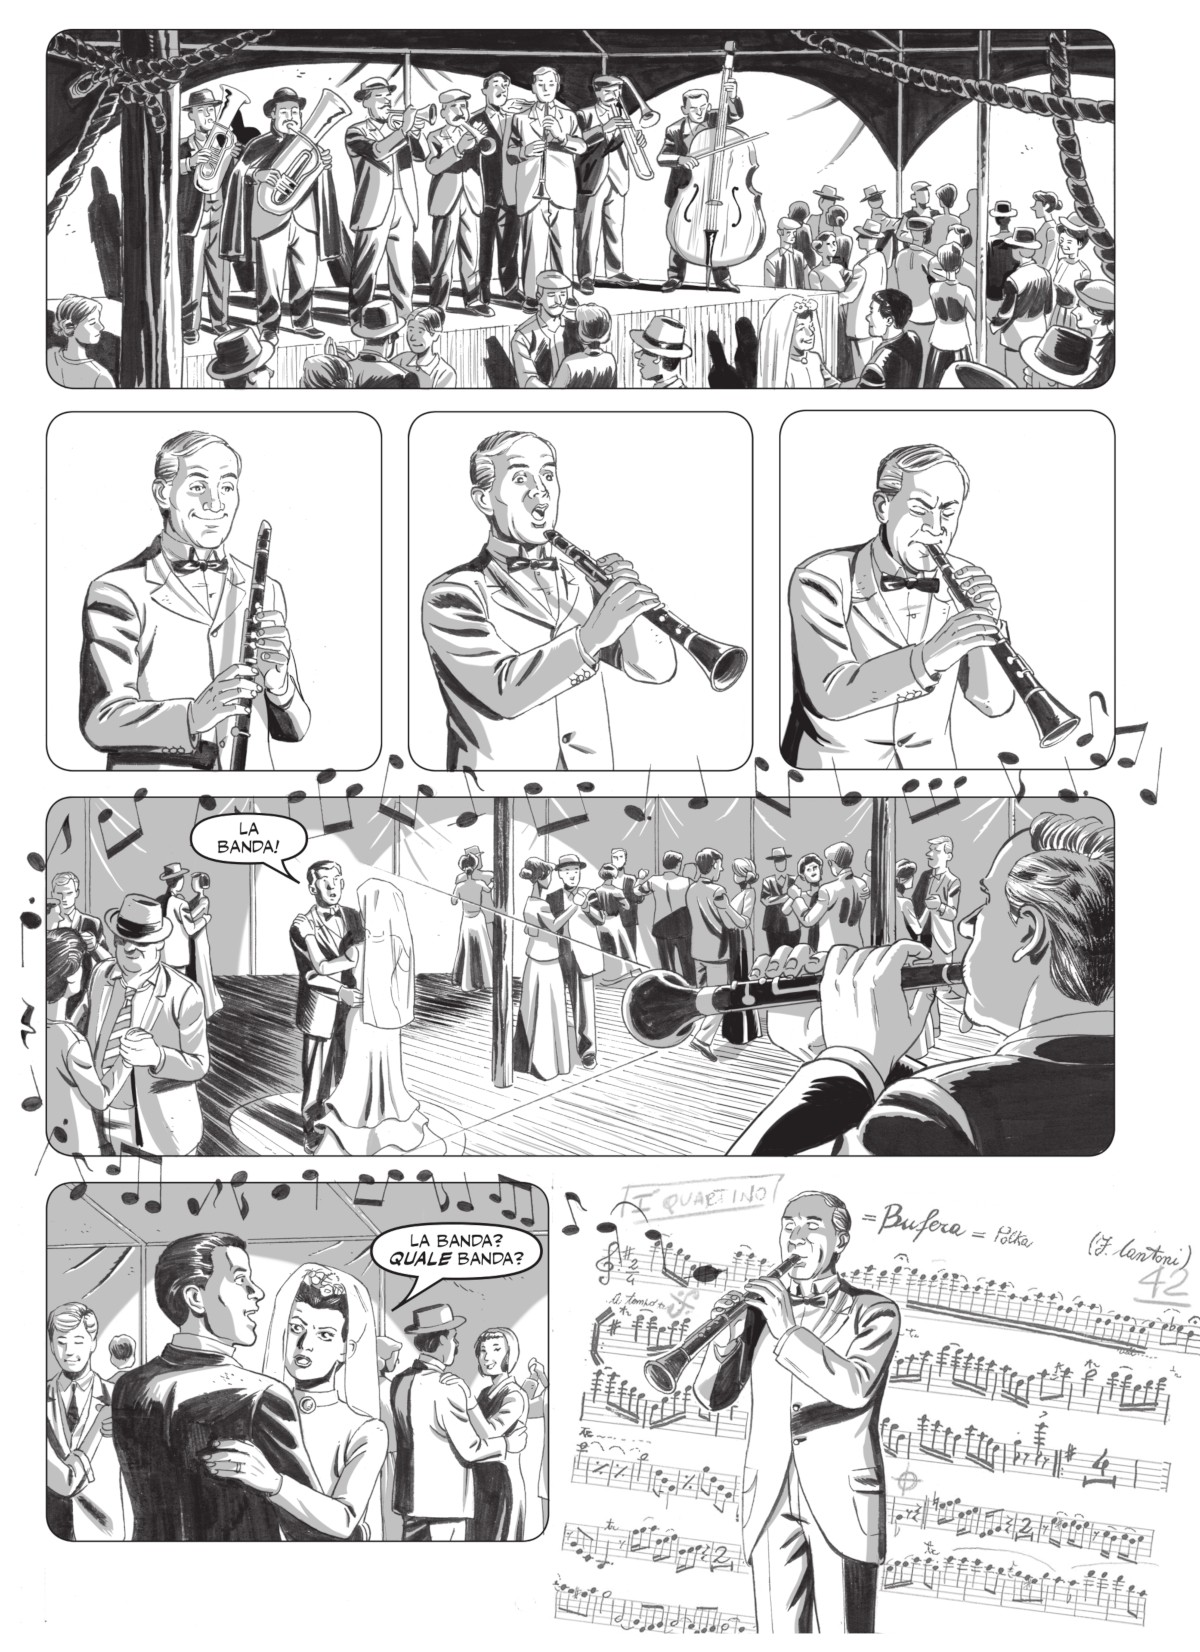 DC_20 La banda, disegni Tommaso Arzeno